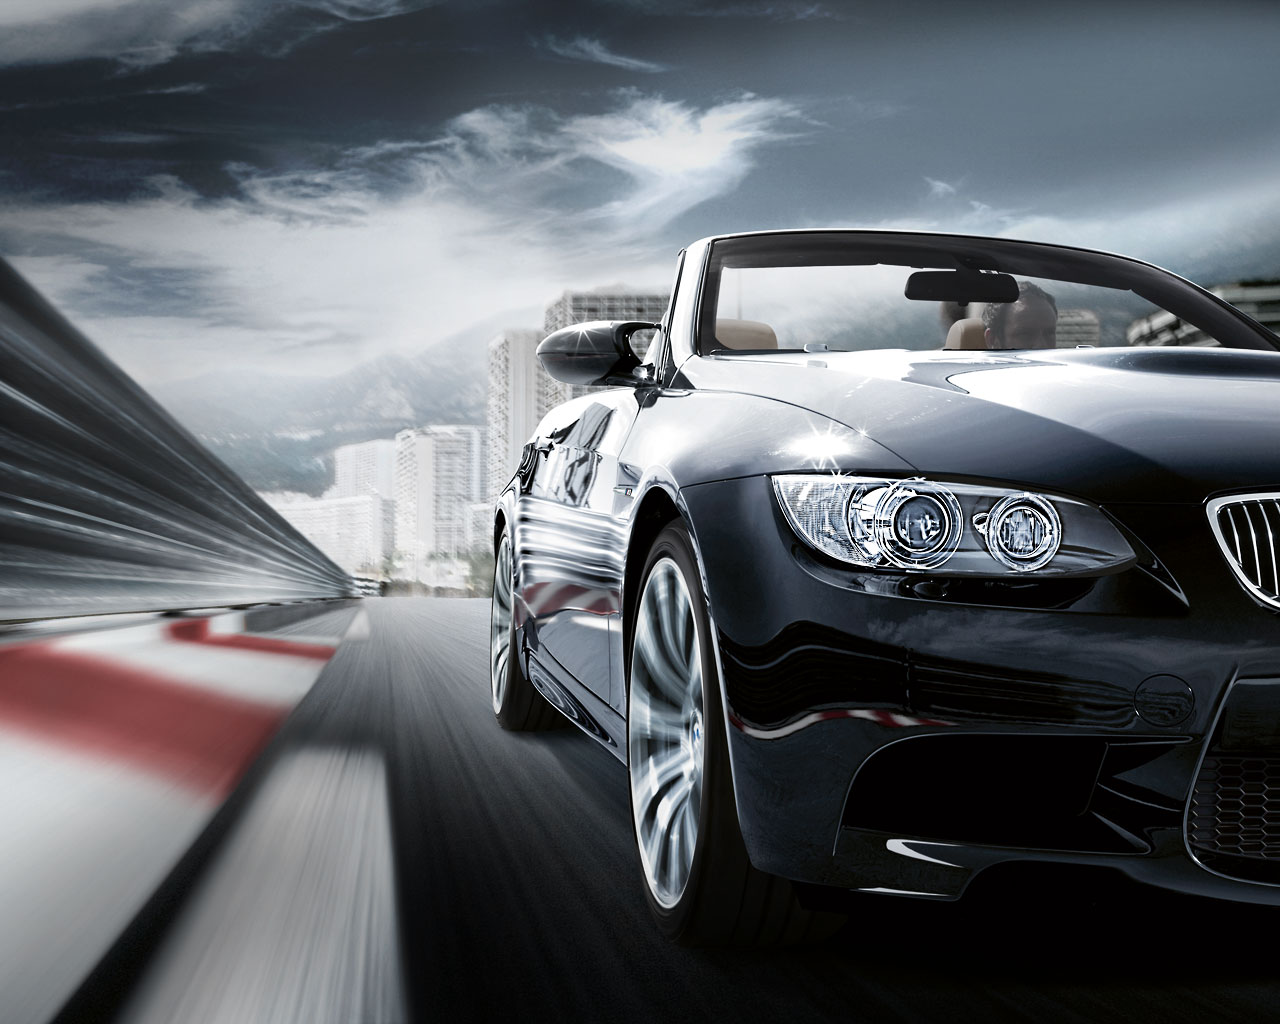 Download BMW M3 Black Wallpaper - My Site